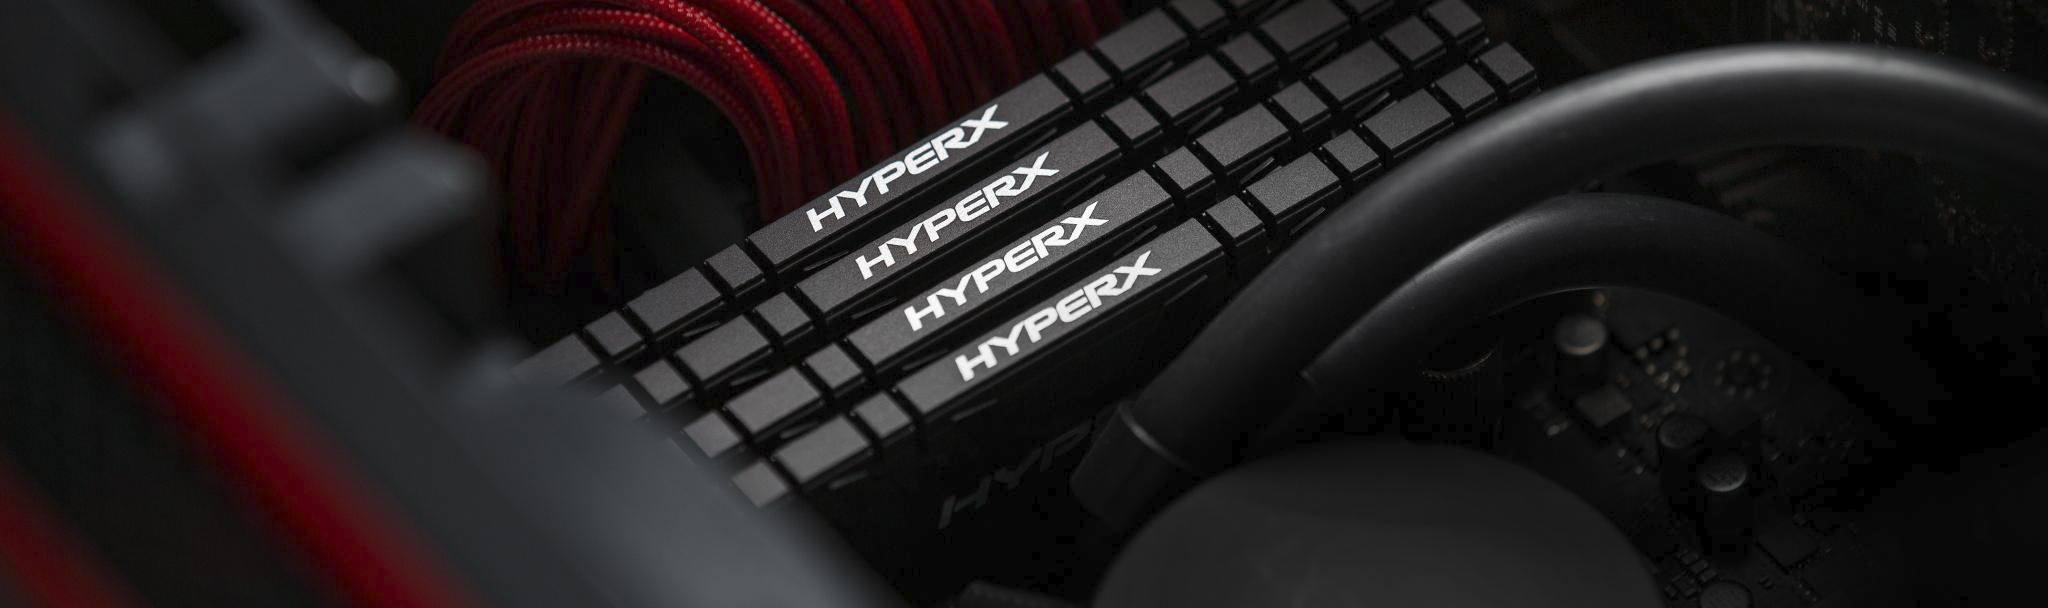 hyperx-memory-predator-ddr4-00